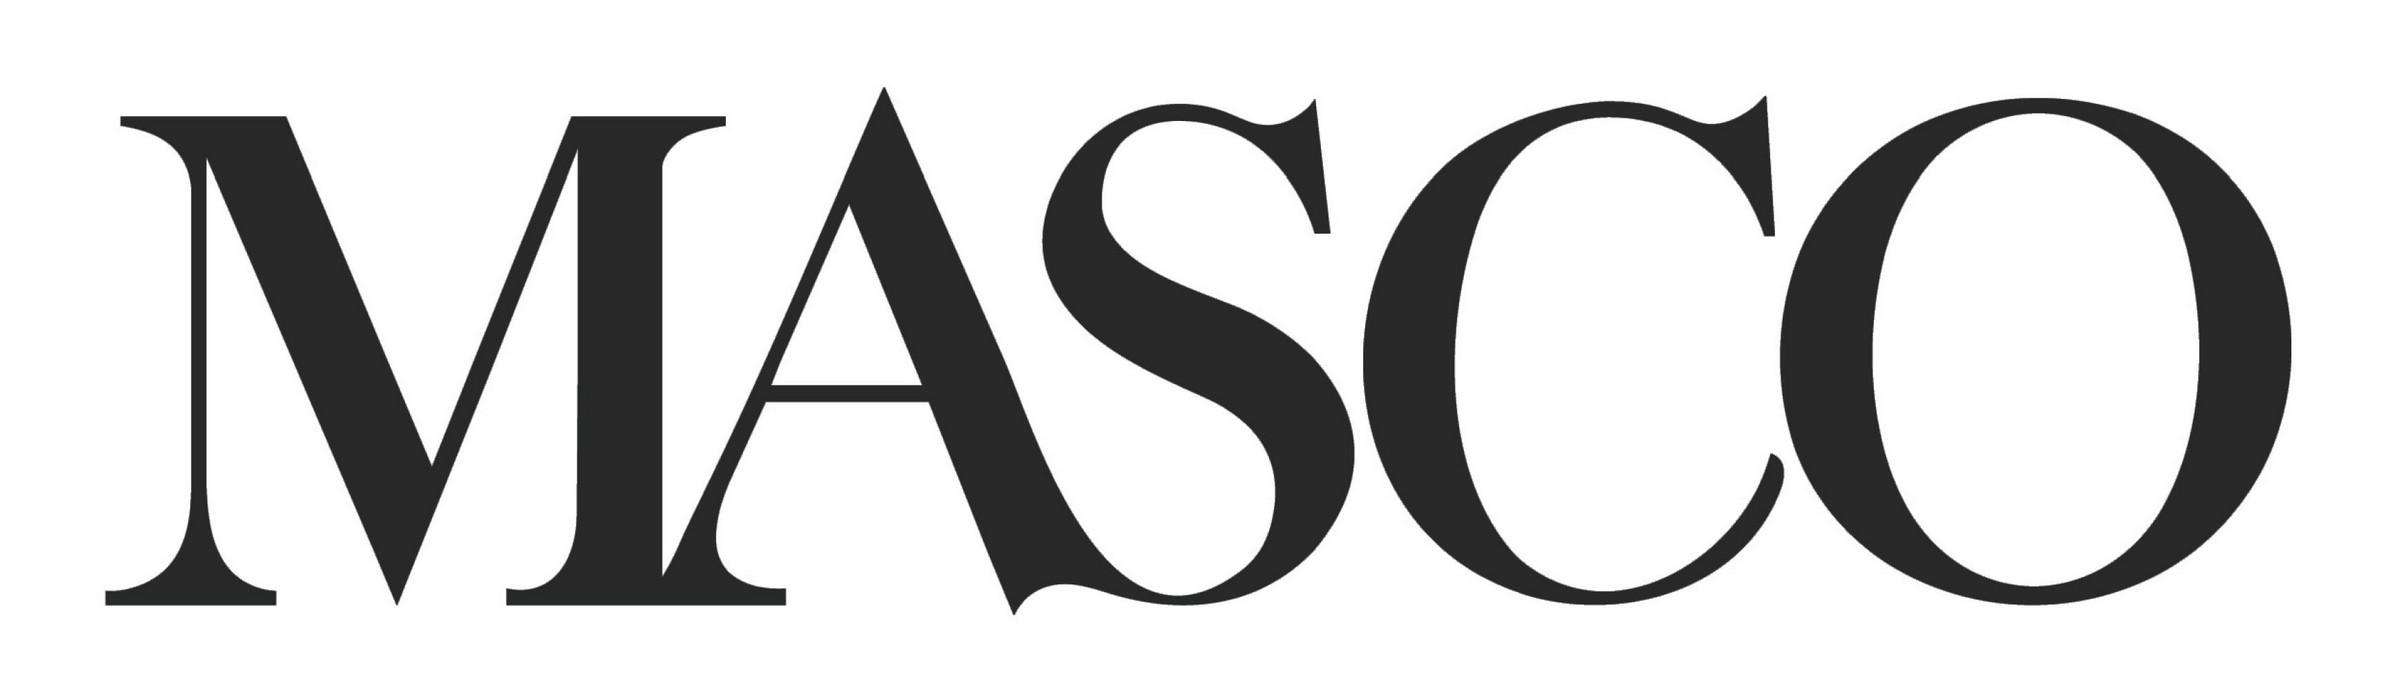 masco logo